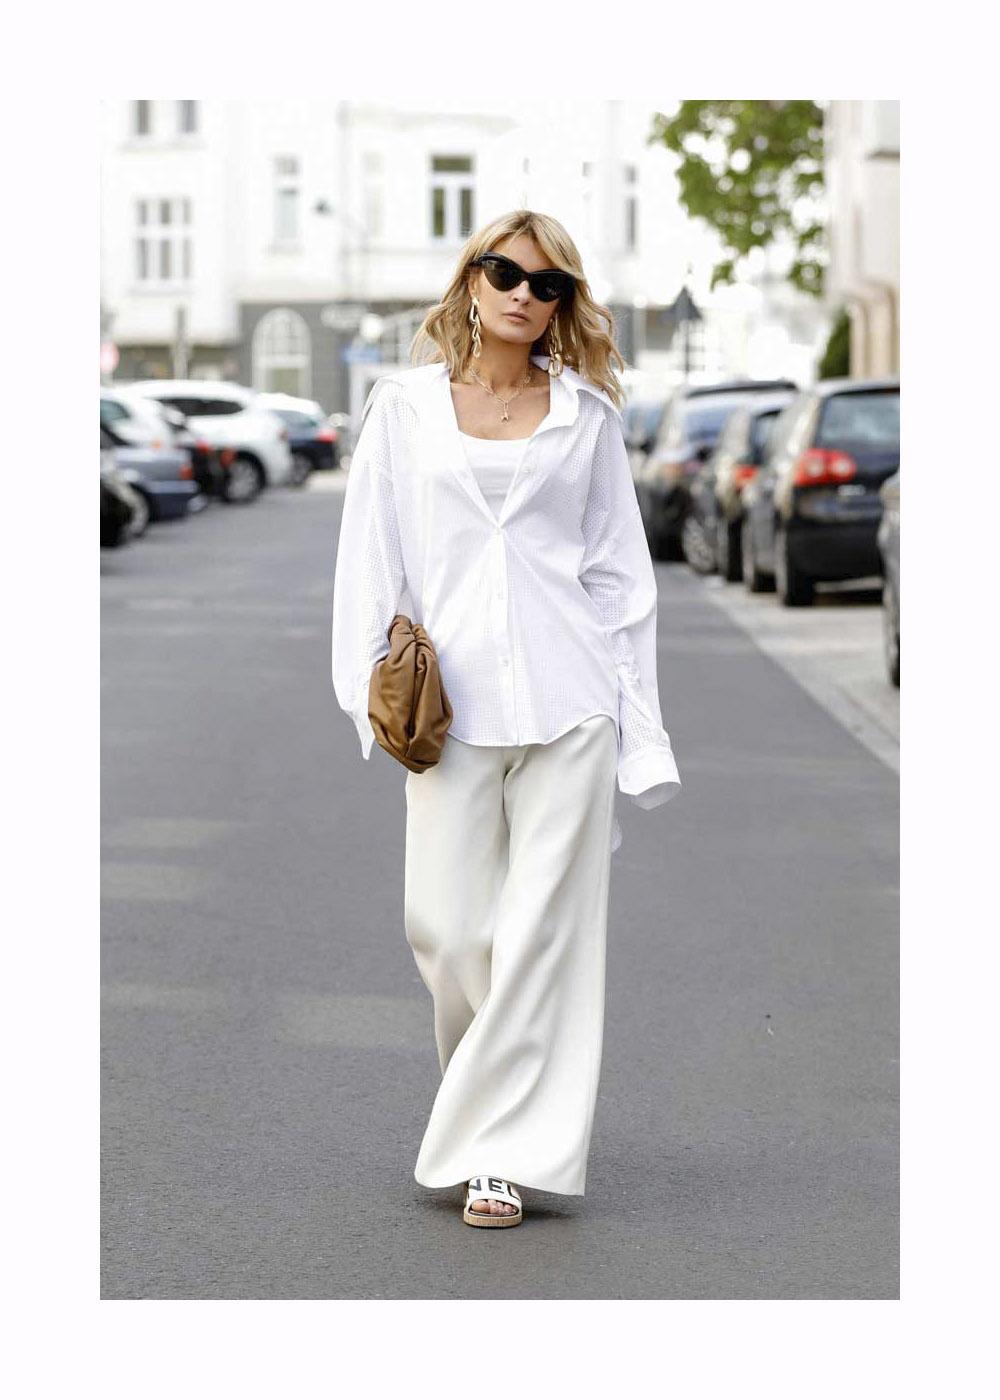 Street Style – Duesseldorf – May 16, 2020